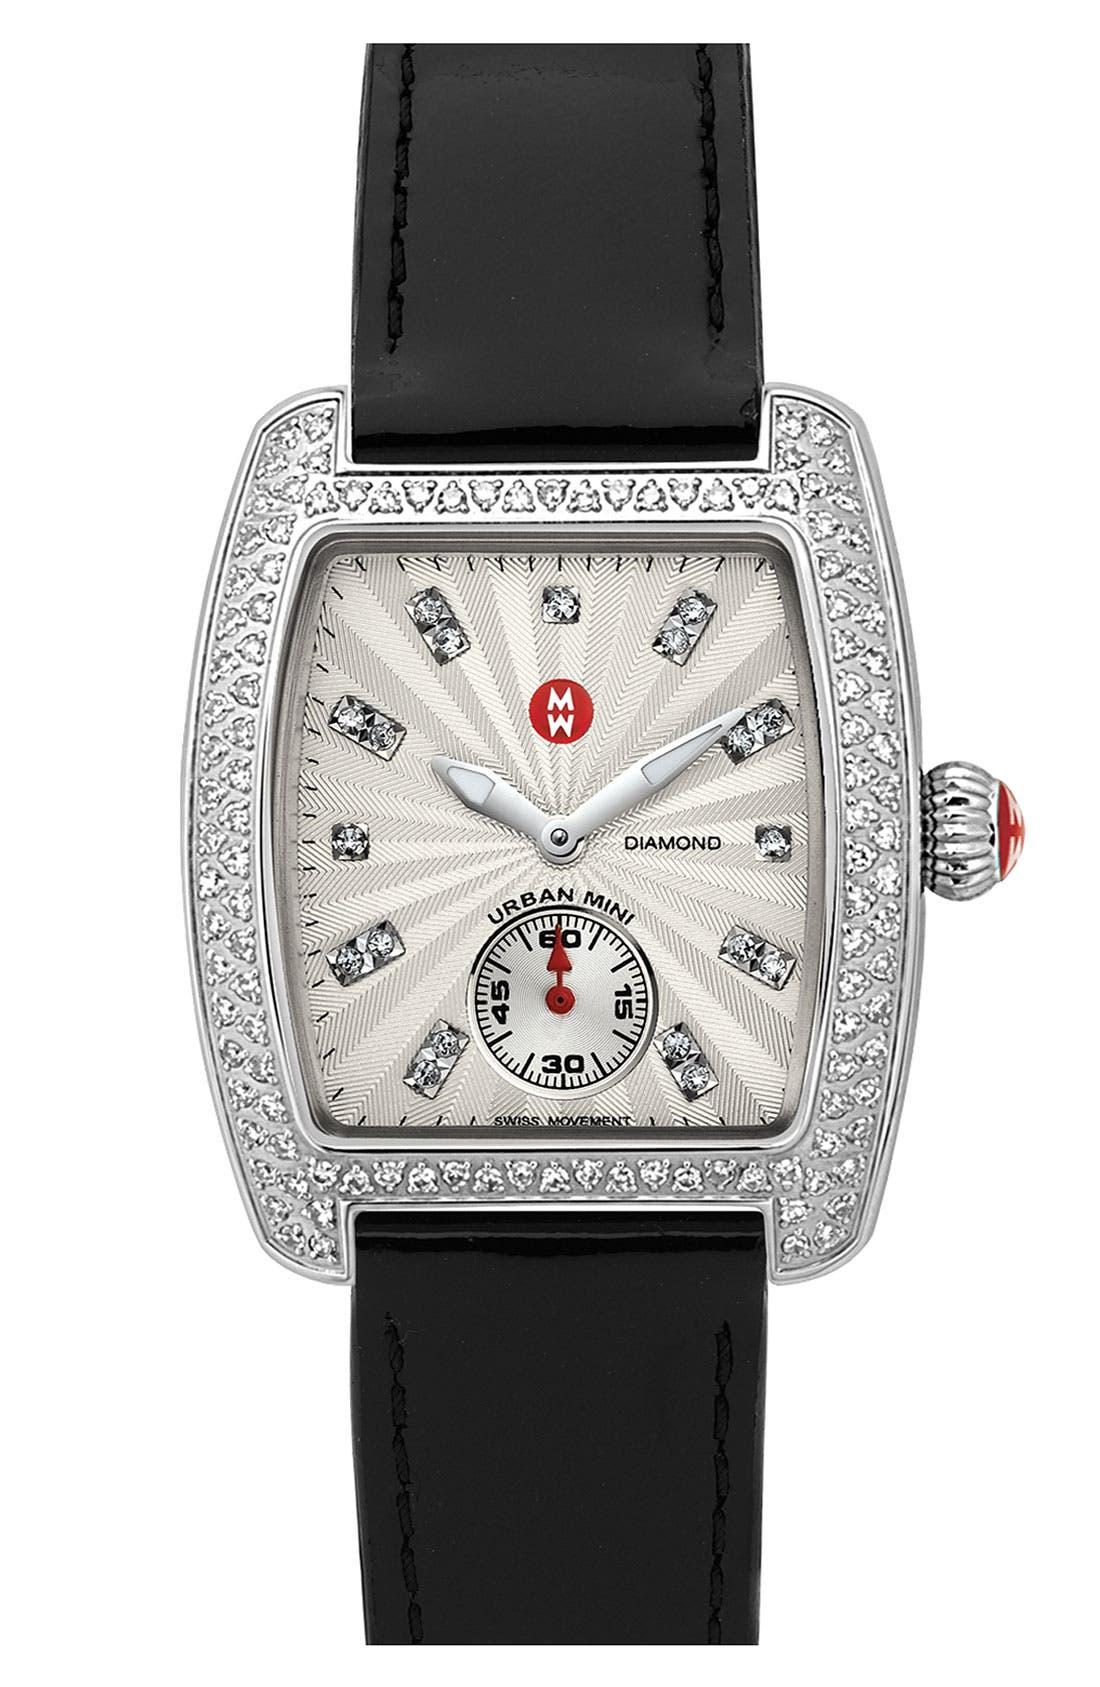 Main Image - MICHELE 'Urban Mini Diamond' Diamond Dial Watch Case & 16mm Black Patent Leather Strap